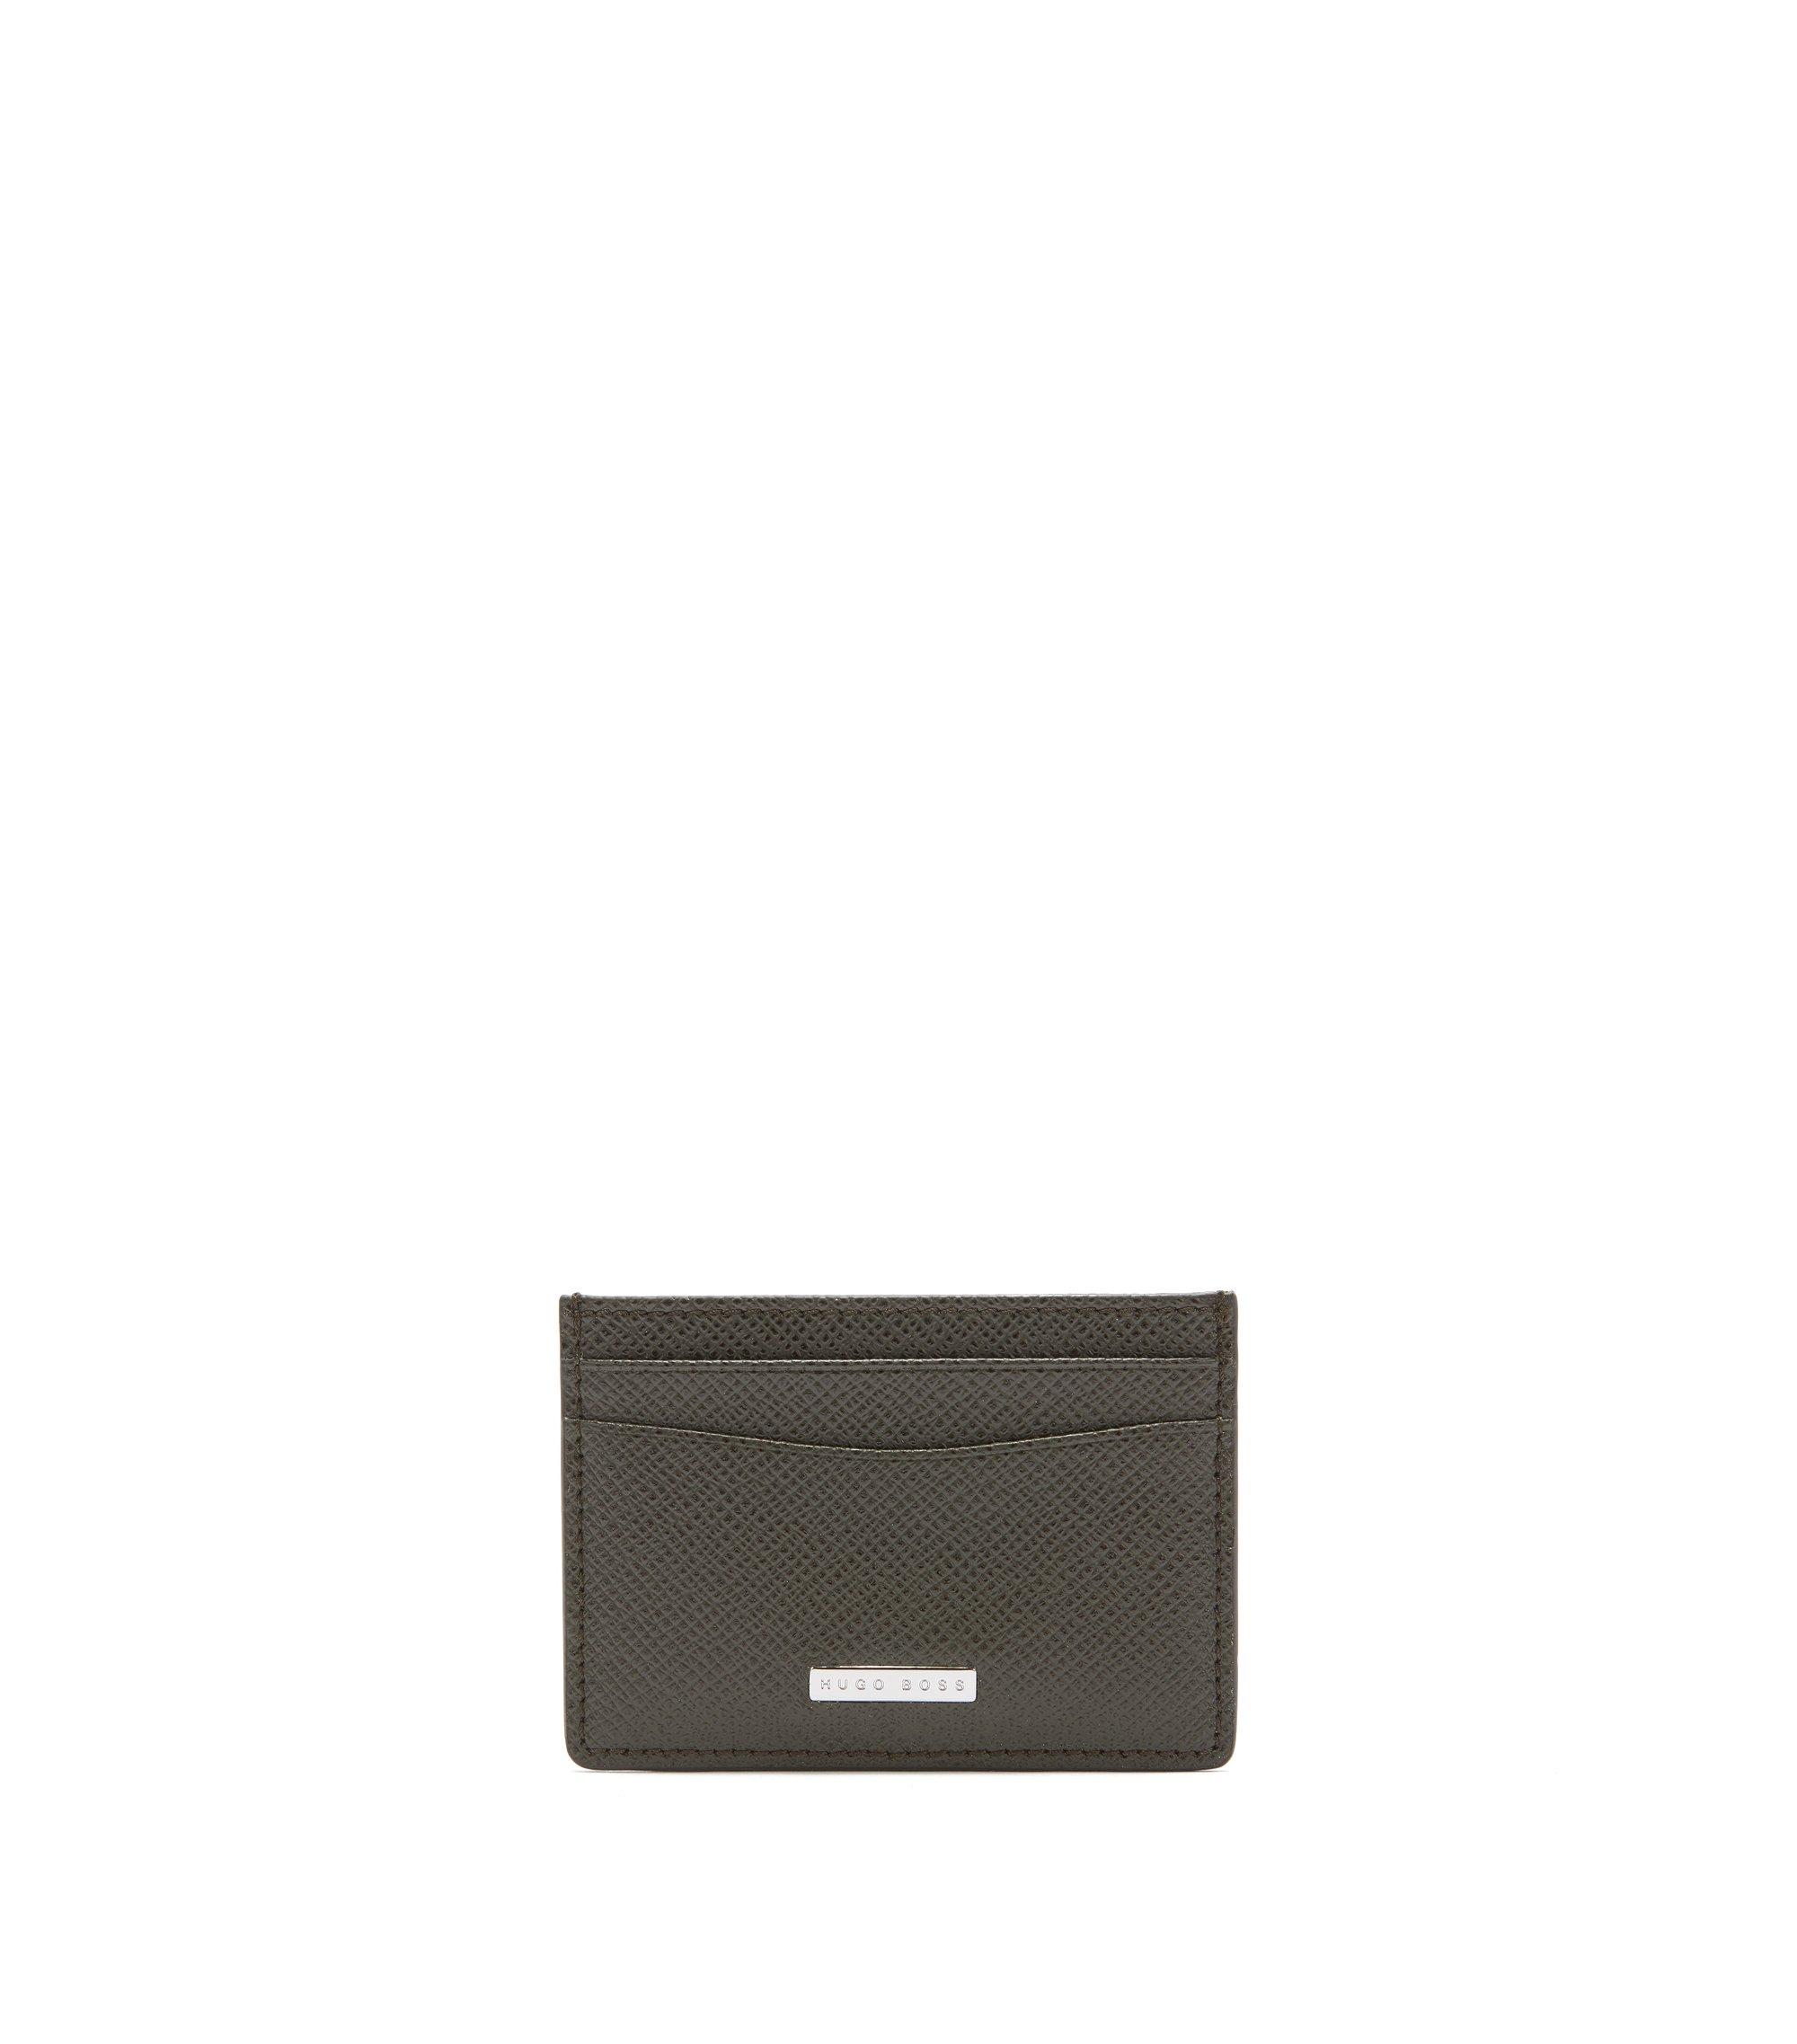 Signature Collection card holder in grained palmellato leather, Dark Green